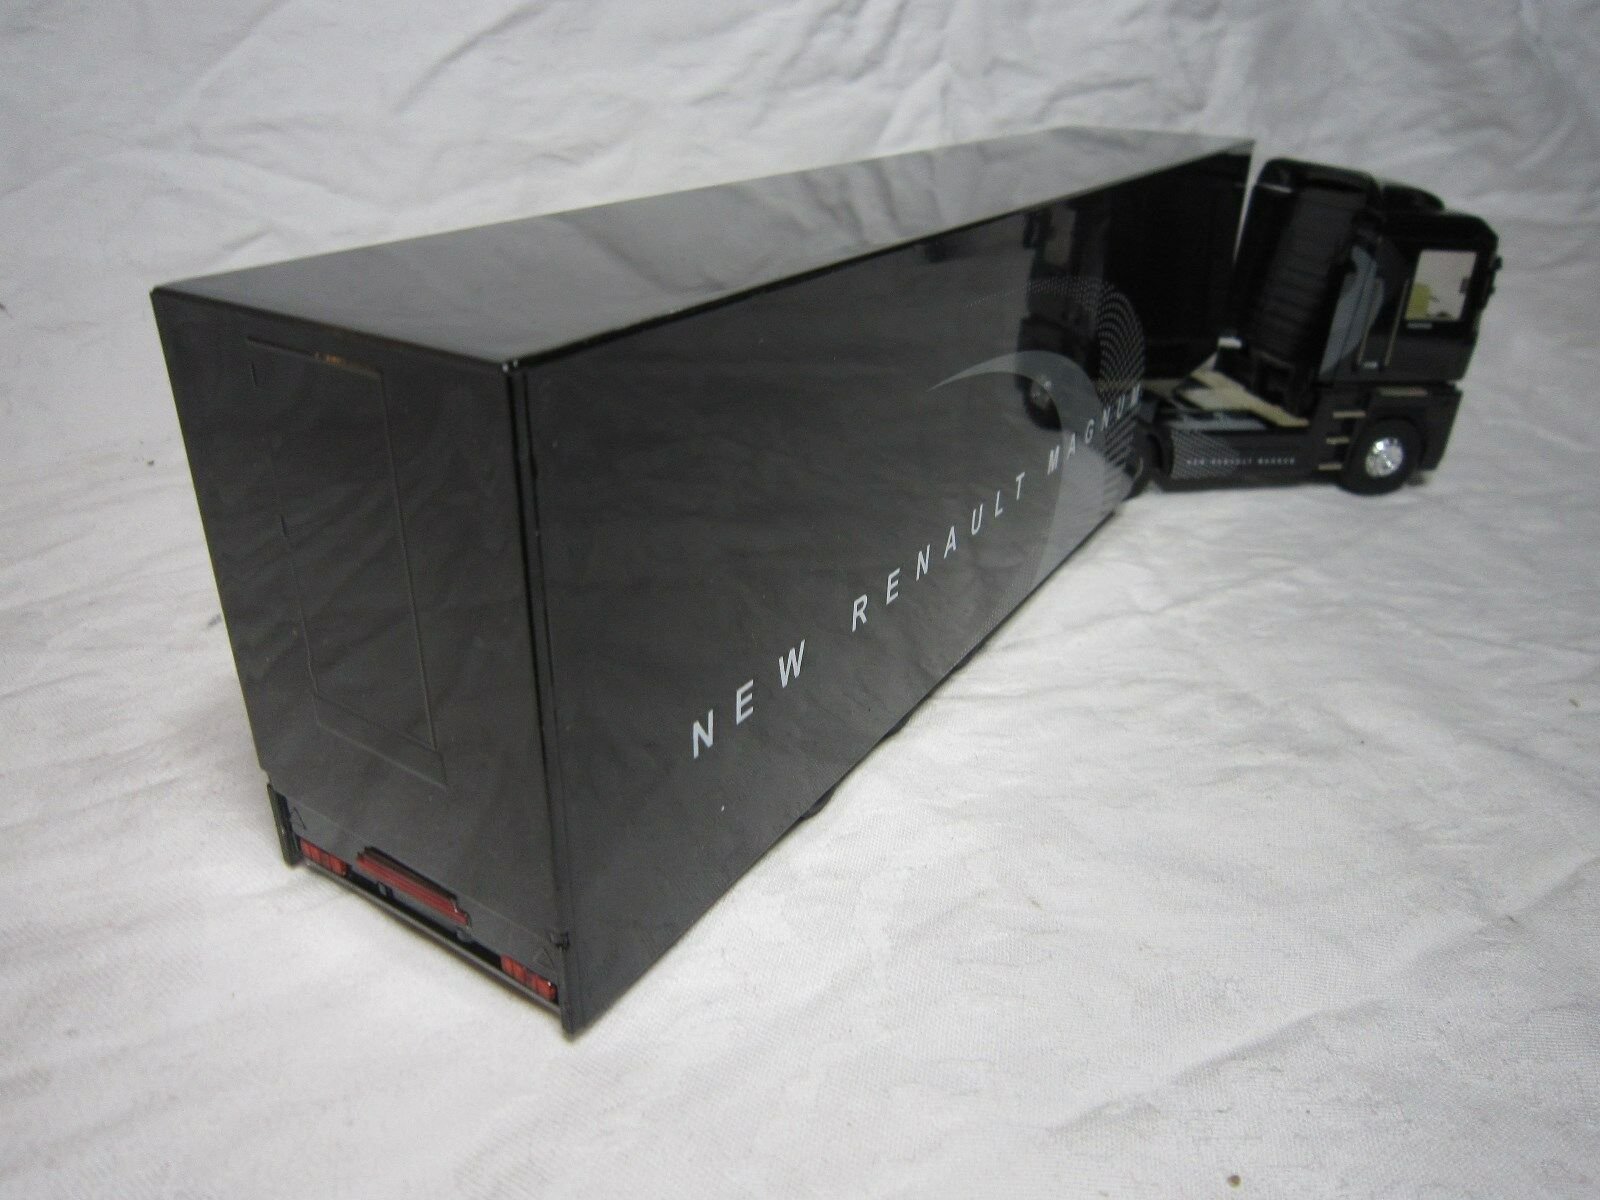 DV7116 LBS ELIGOR 1 43 RENAULT NEW NEW NEW MAGNUM 480 Ref 5001901345 PROMOTIONNEL bb83e9